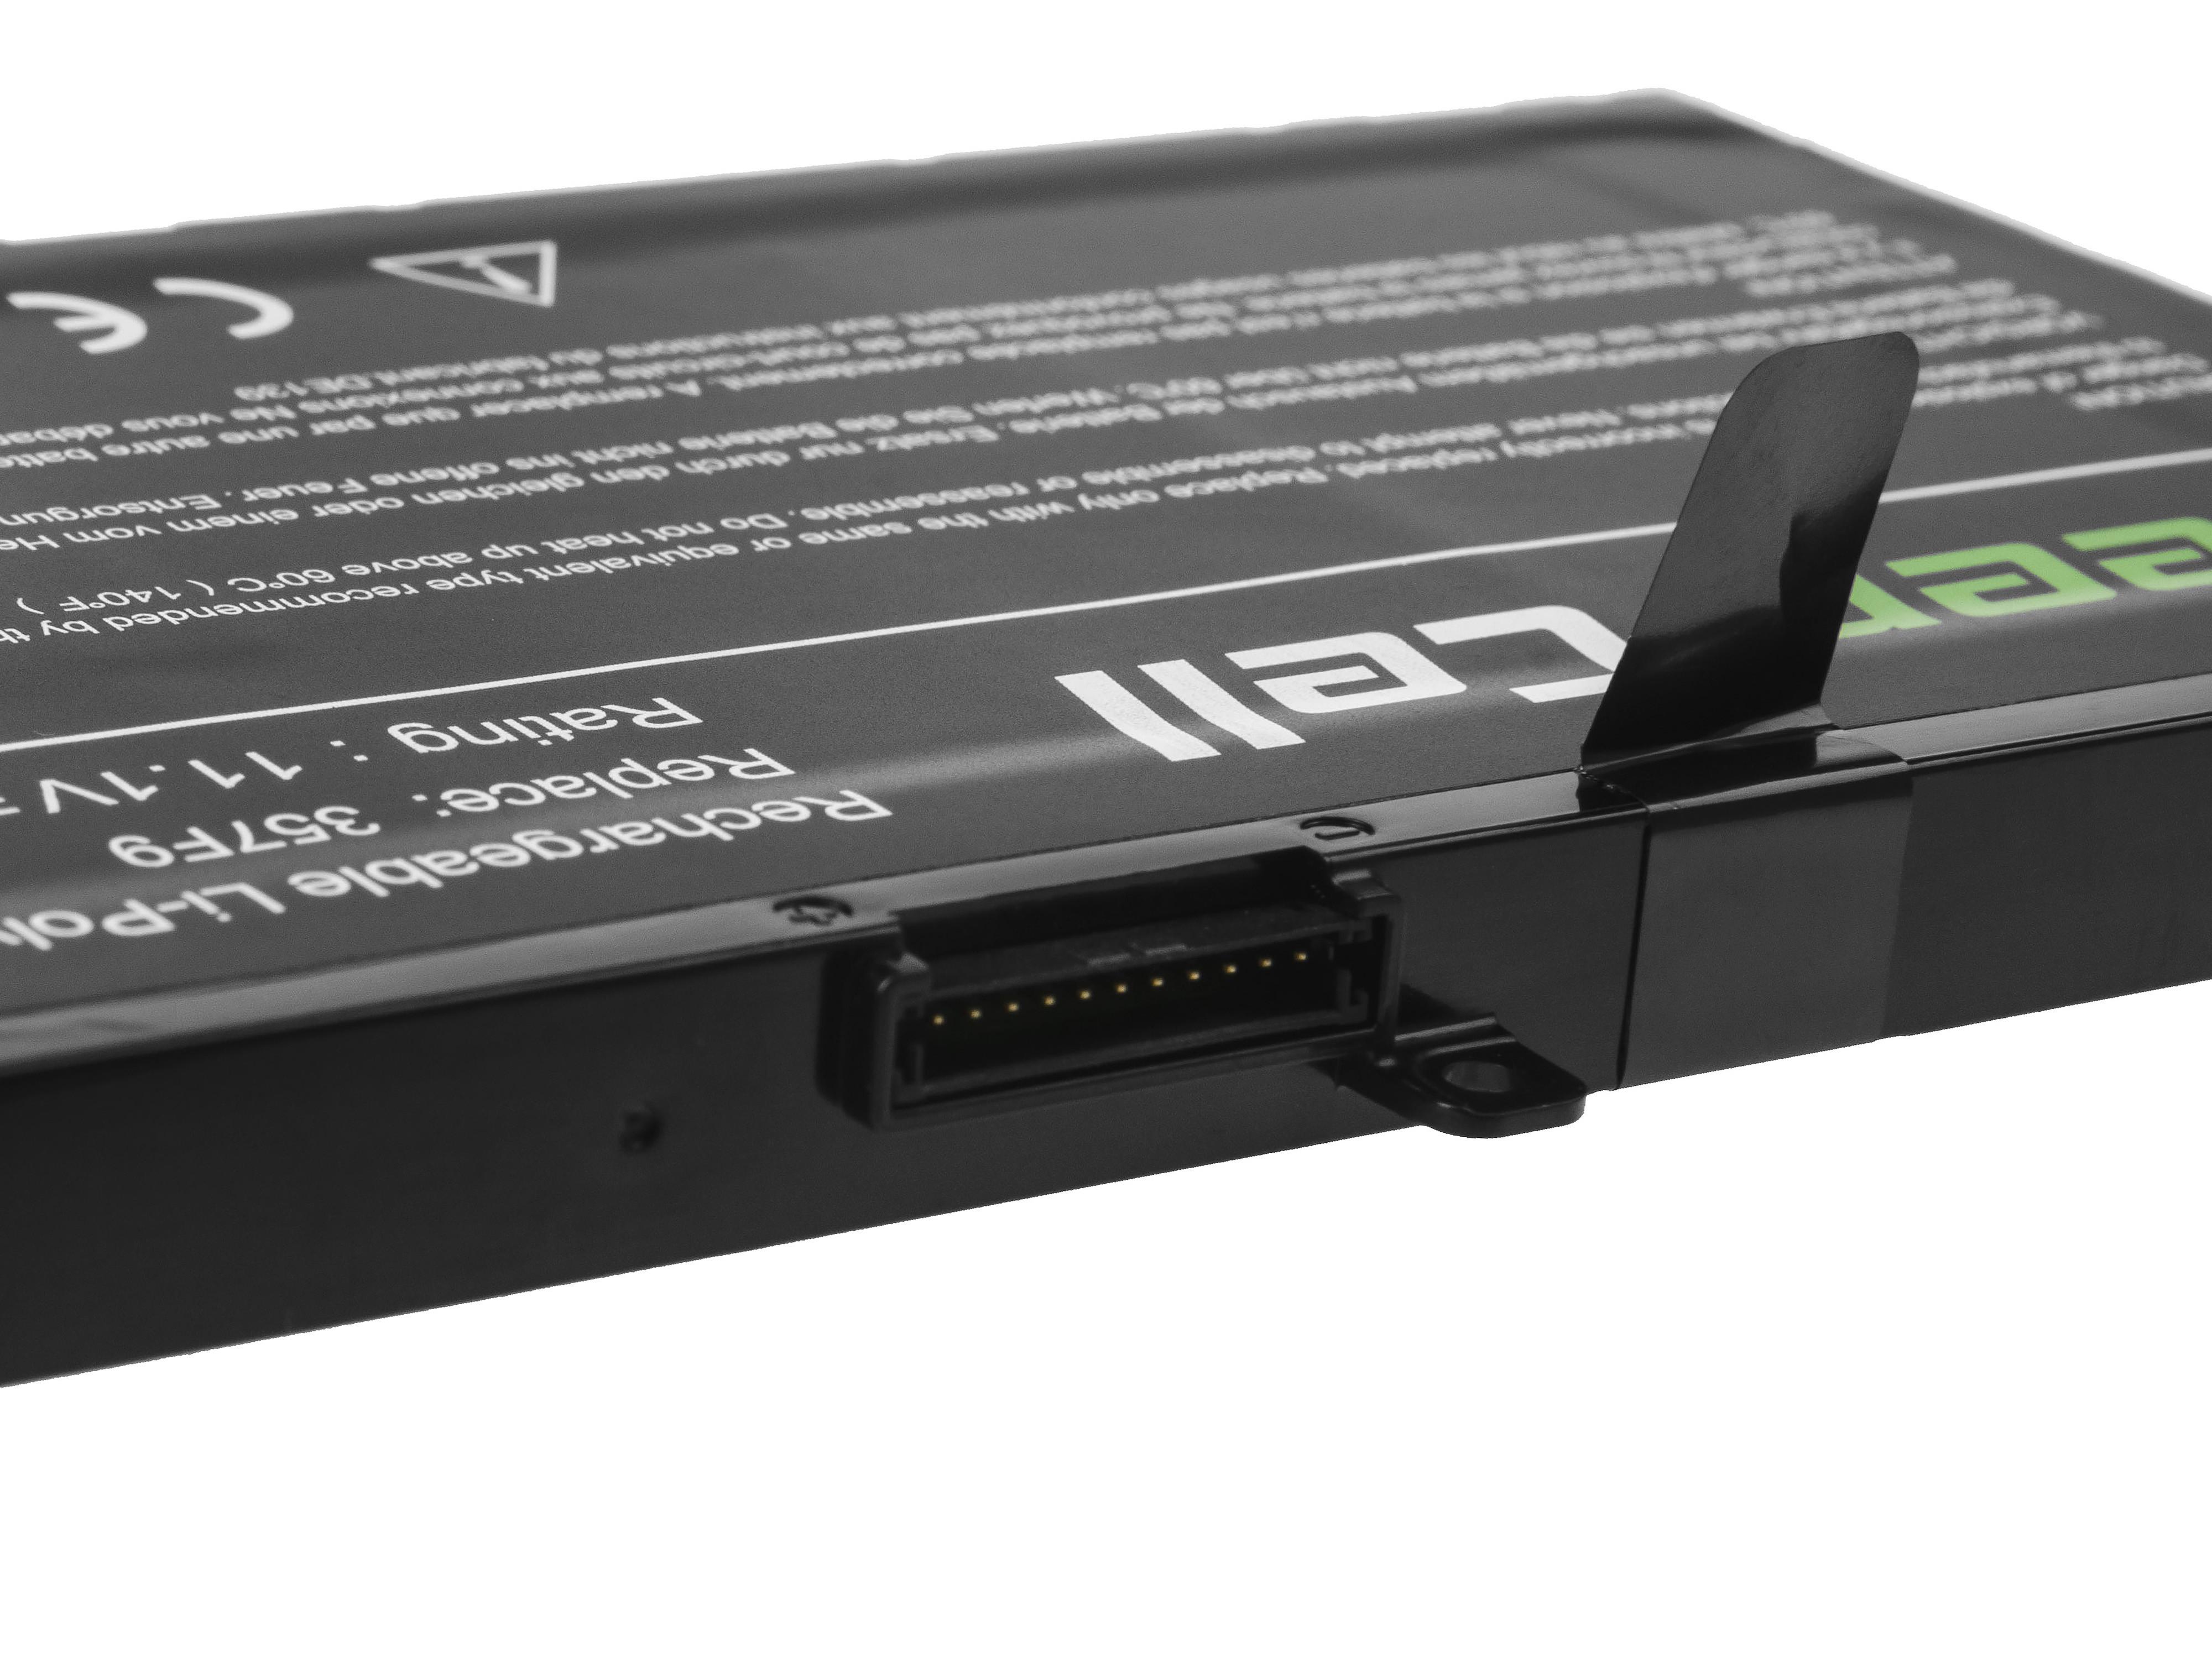 Green Cell DE139 Baterie Dell 357F9, Dell Inspiron 15 5576 5577 7557 7559 7566 7567 4200mAh Li-Pol – neoriginální